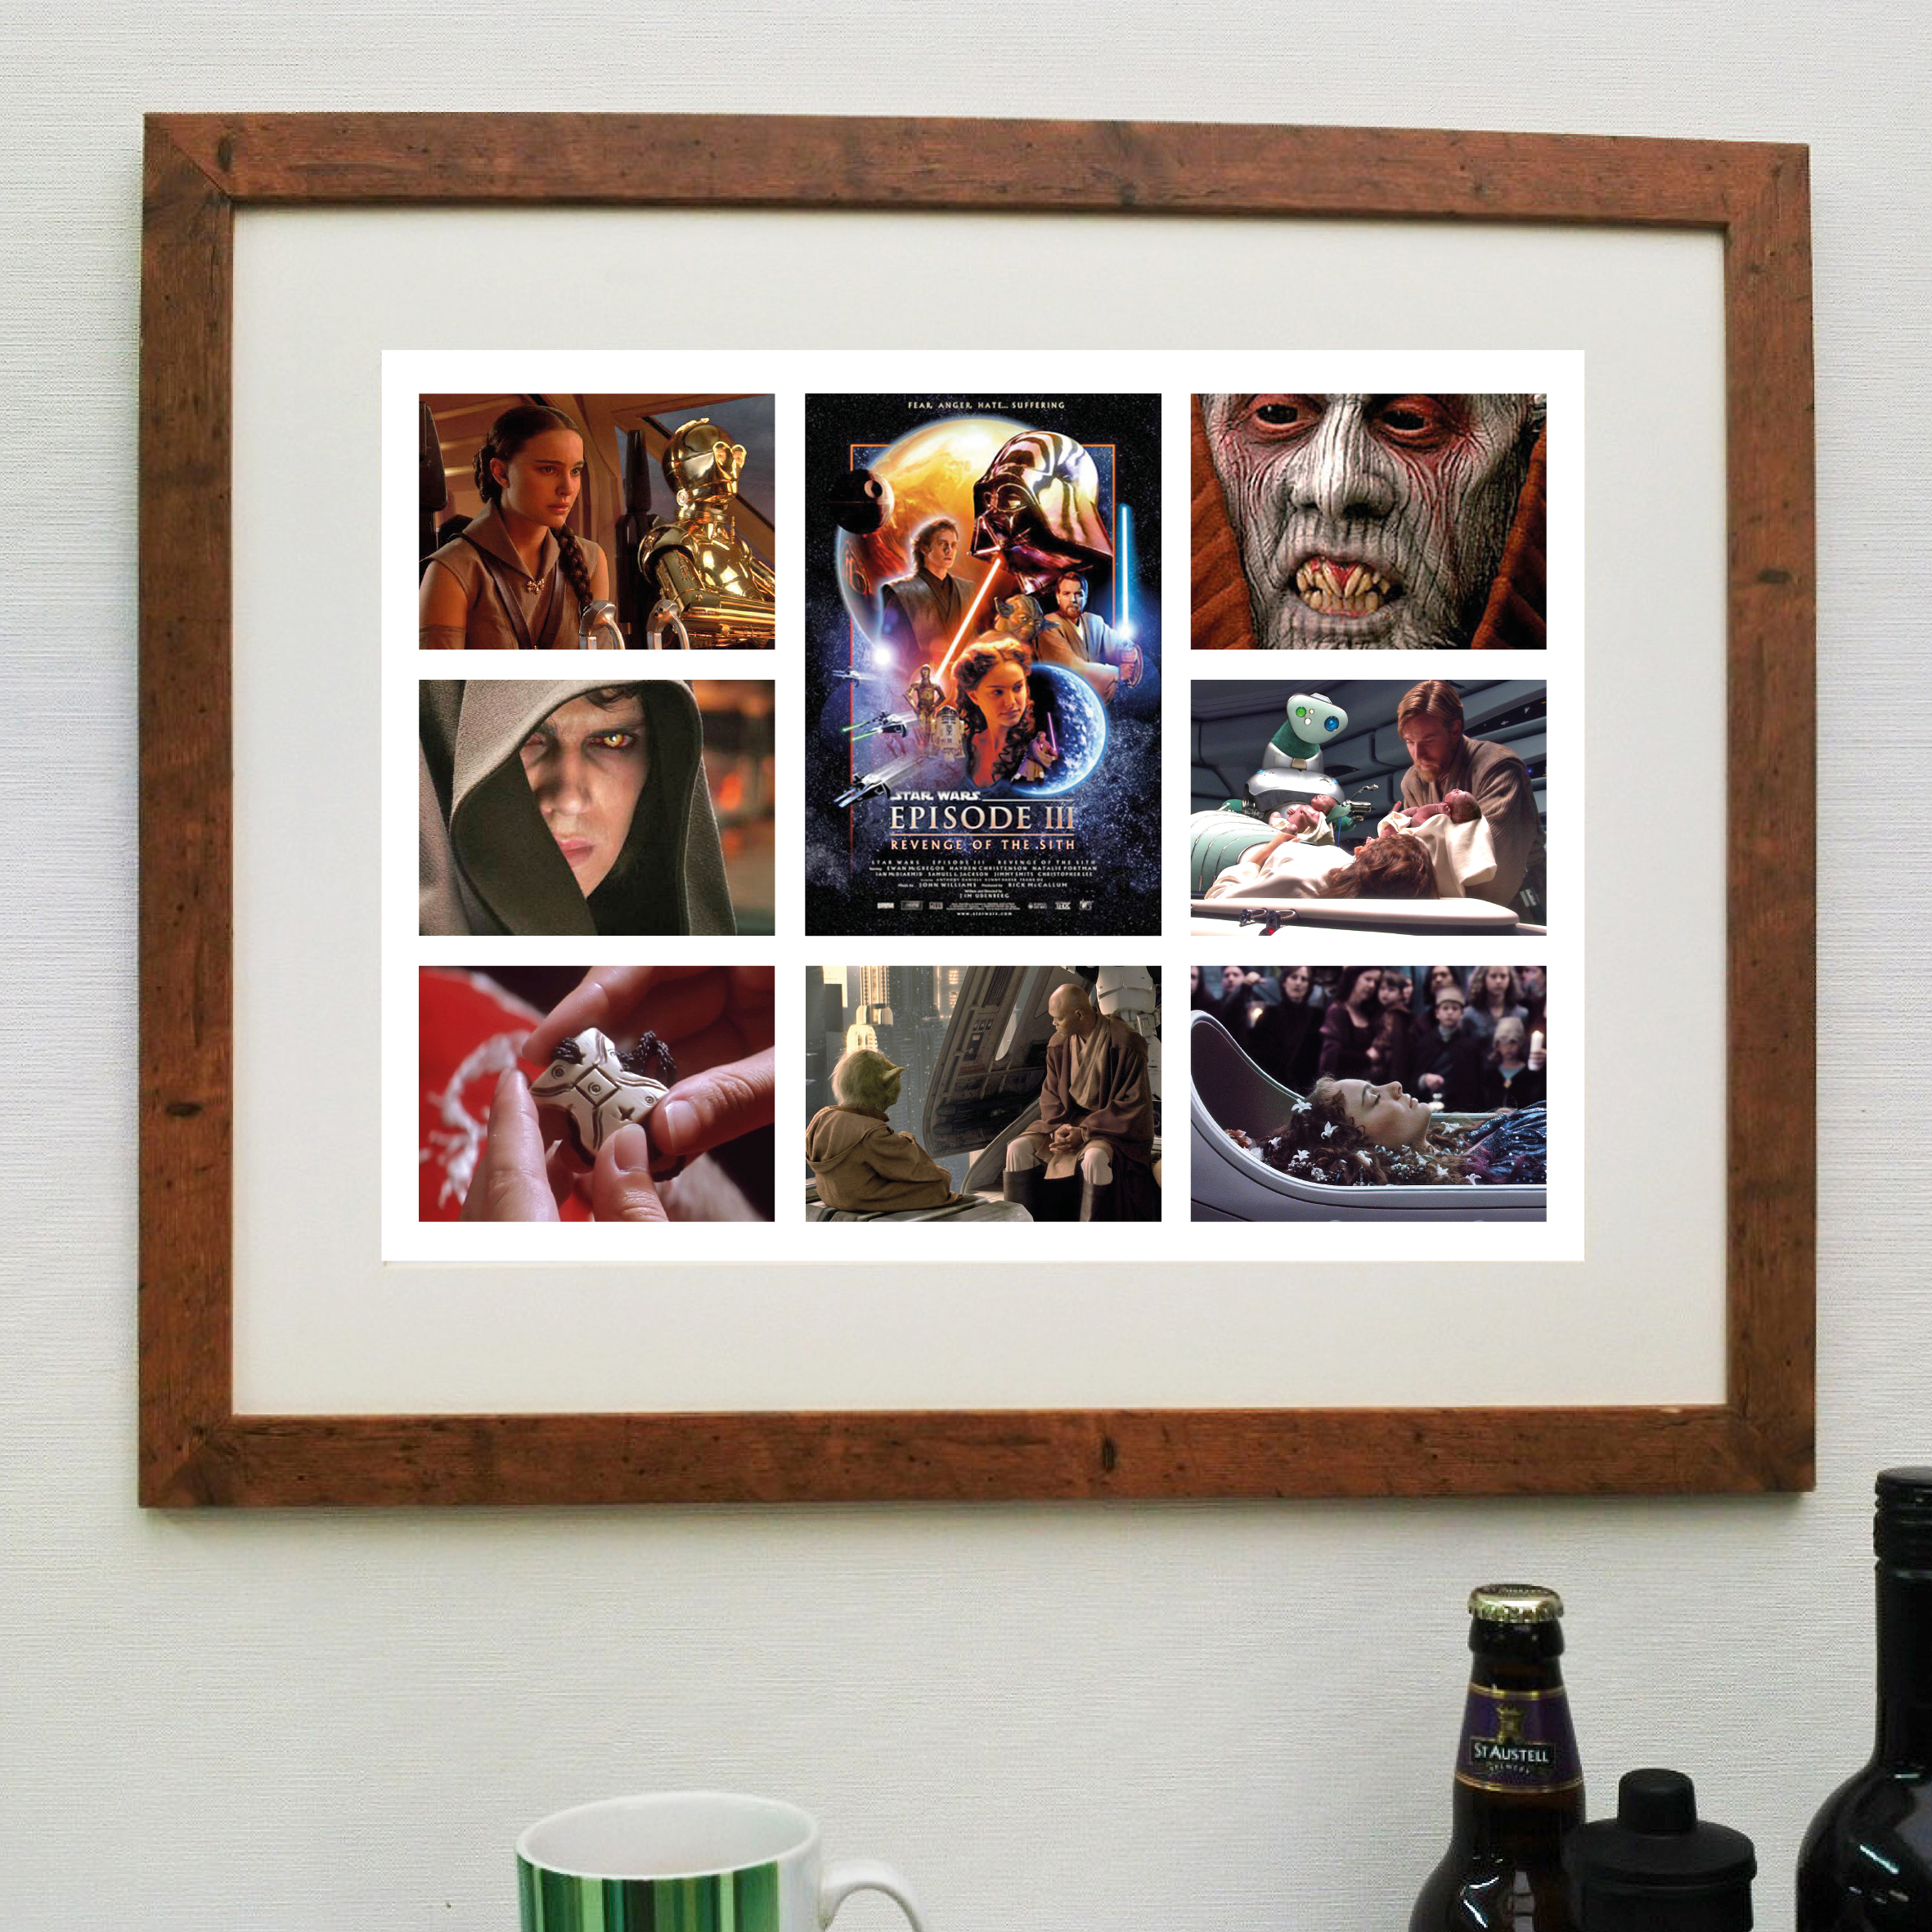 Star Wars Revenge Of The Sith Scene It Movie Poster Hokey Cokey